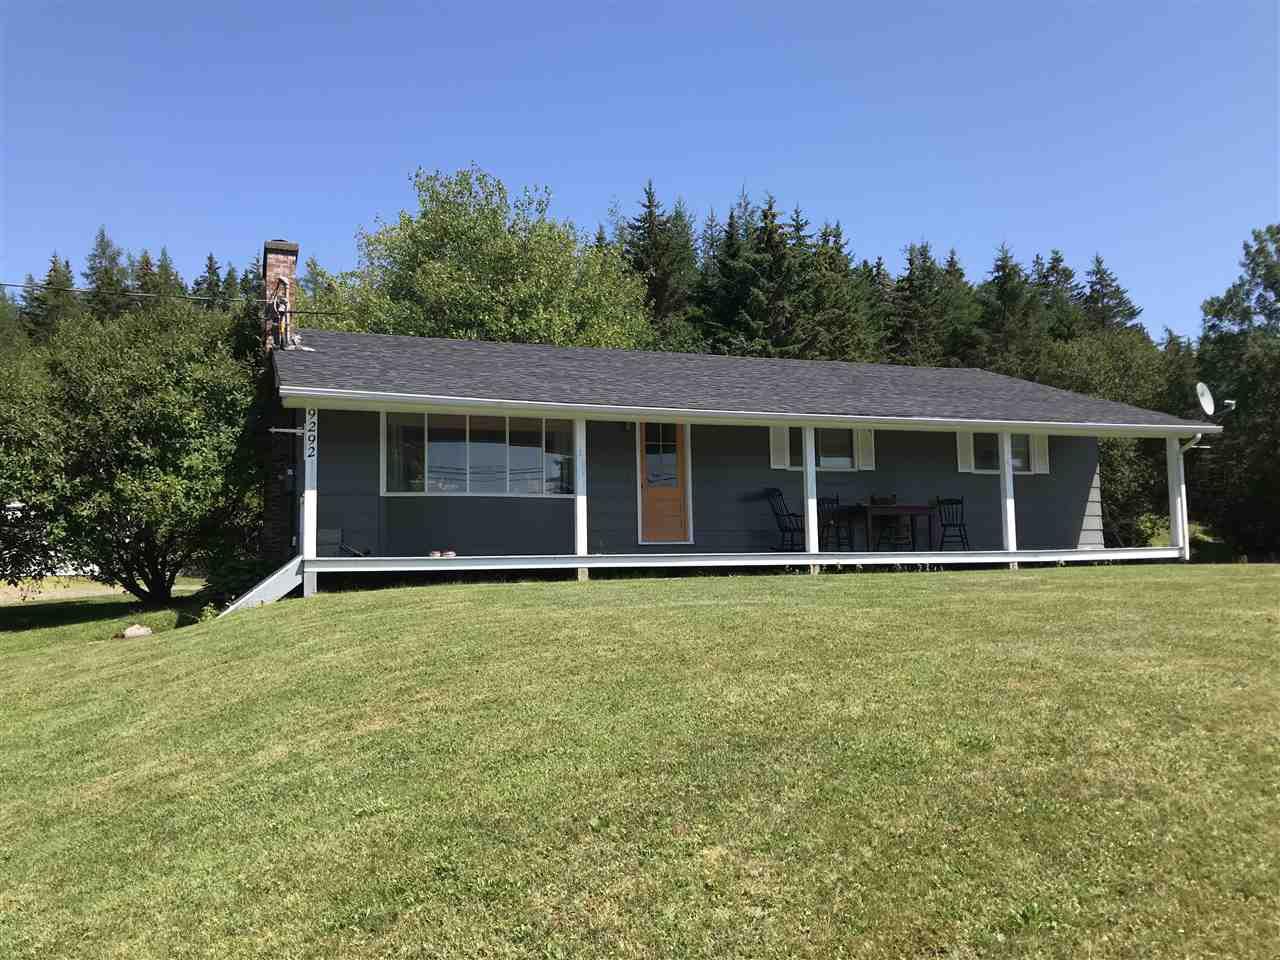 Main Photo: 9292 Highway 7 in Stillwater: 303-Guysborough County Residential for sale (Highland Region)  : MLS®# 201920033